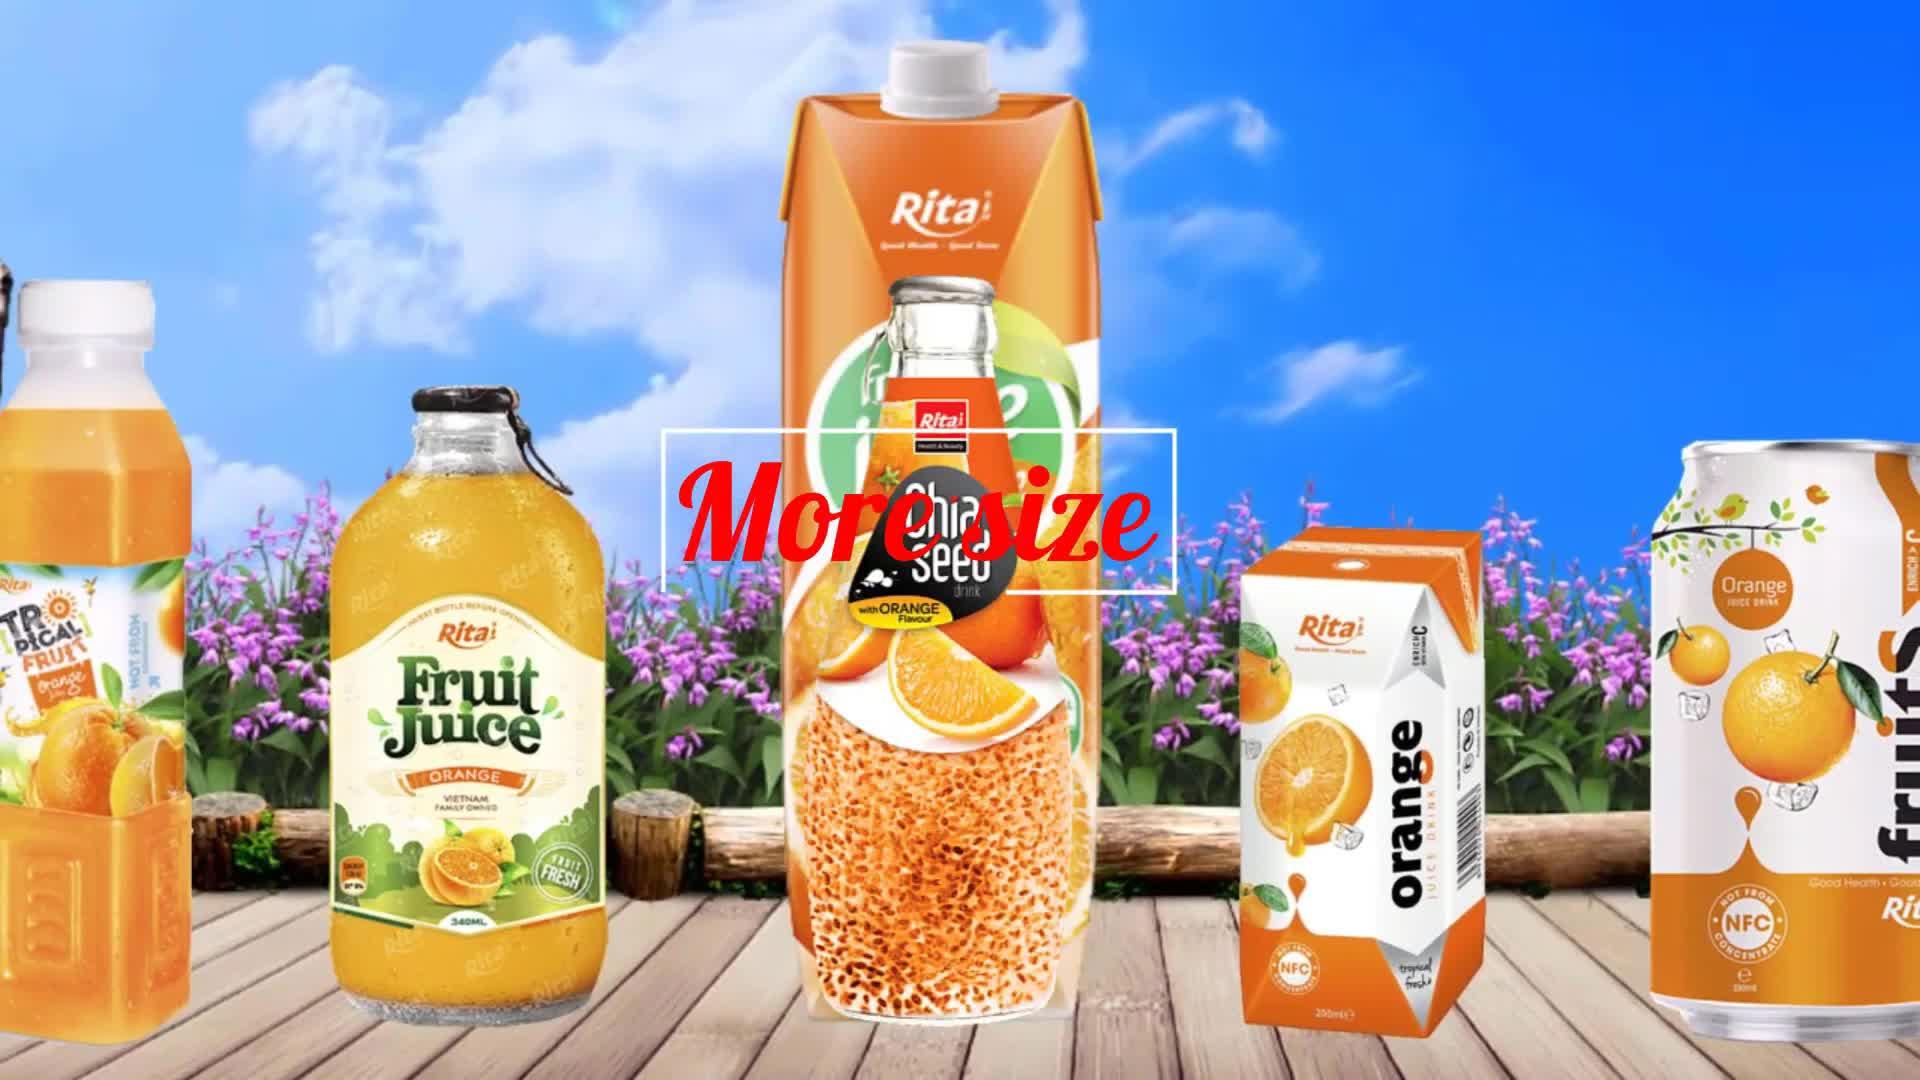 Rita Beverage  330ml Orange Fruit Juice Drink